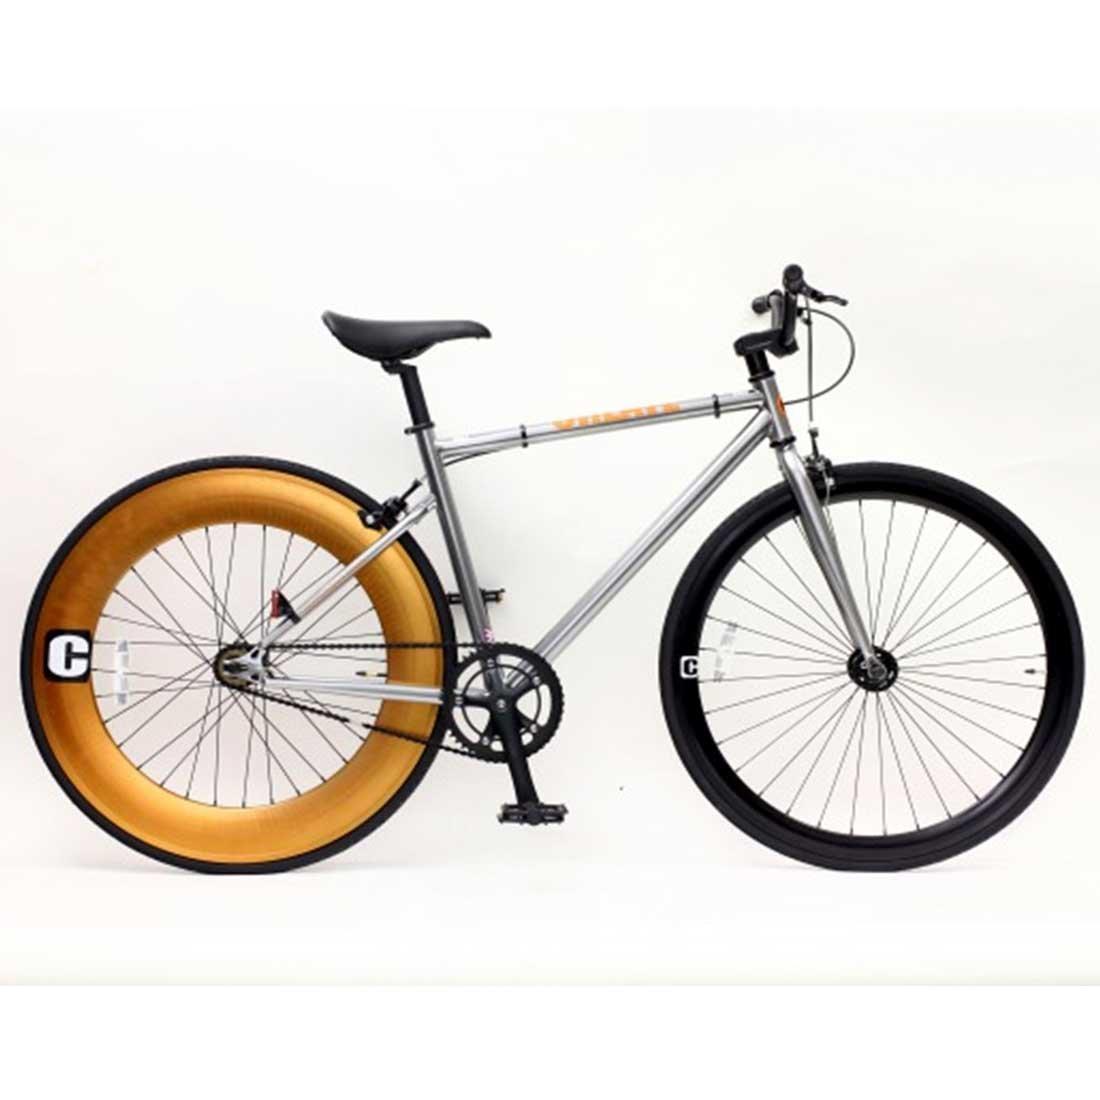 【CREATE BIKES Single-PisteBike】 ストリートピストバイク  湘南鵠沼海岸発信 B0765R275Rシルバー 520mm(170cm~)